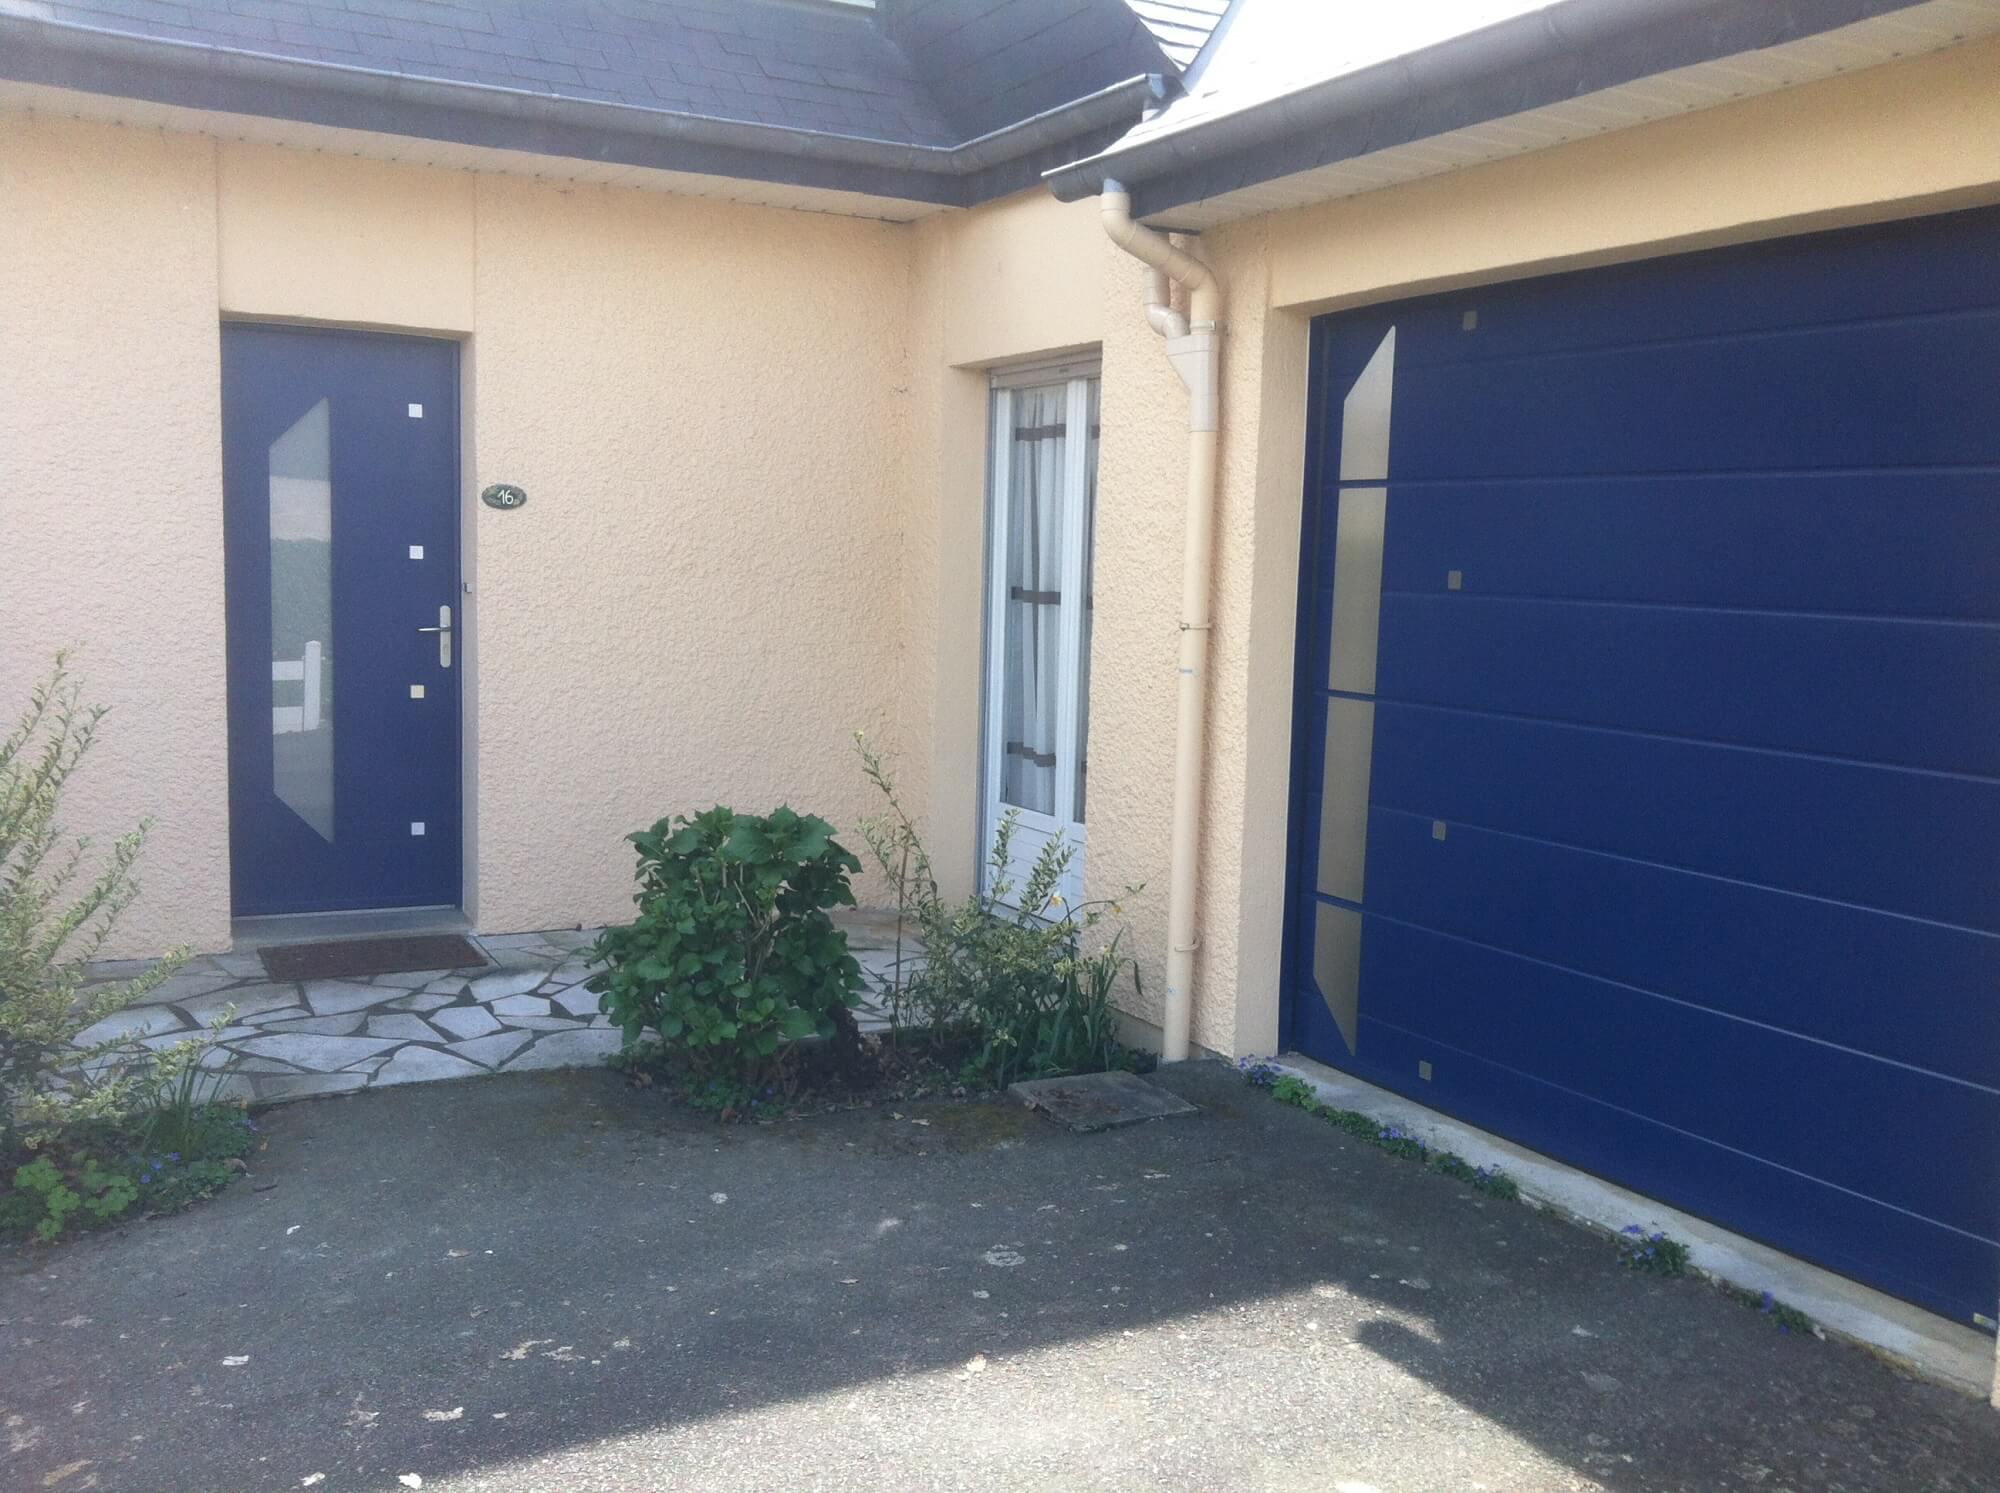 Delightful porte d entree blanche 2 porte de garage for Porte de garage